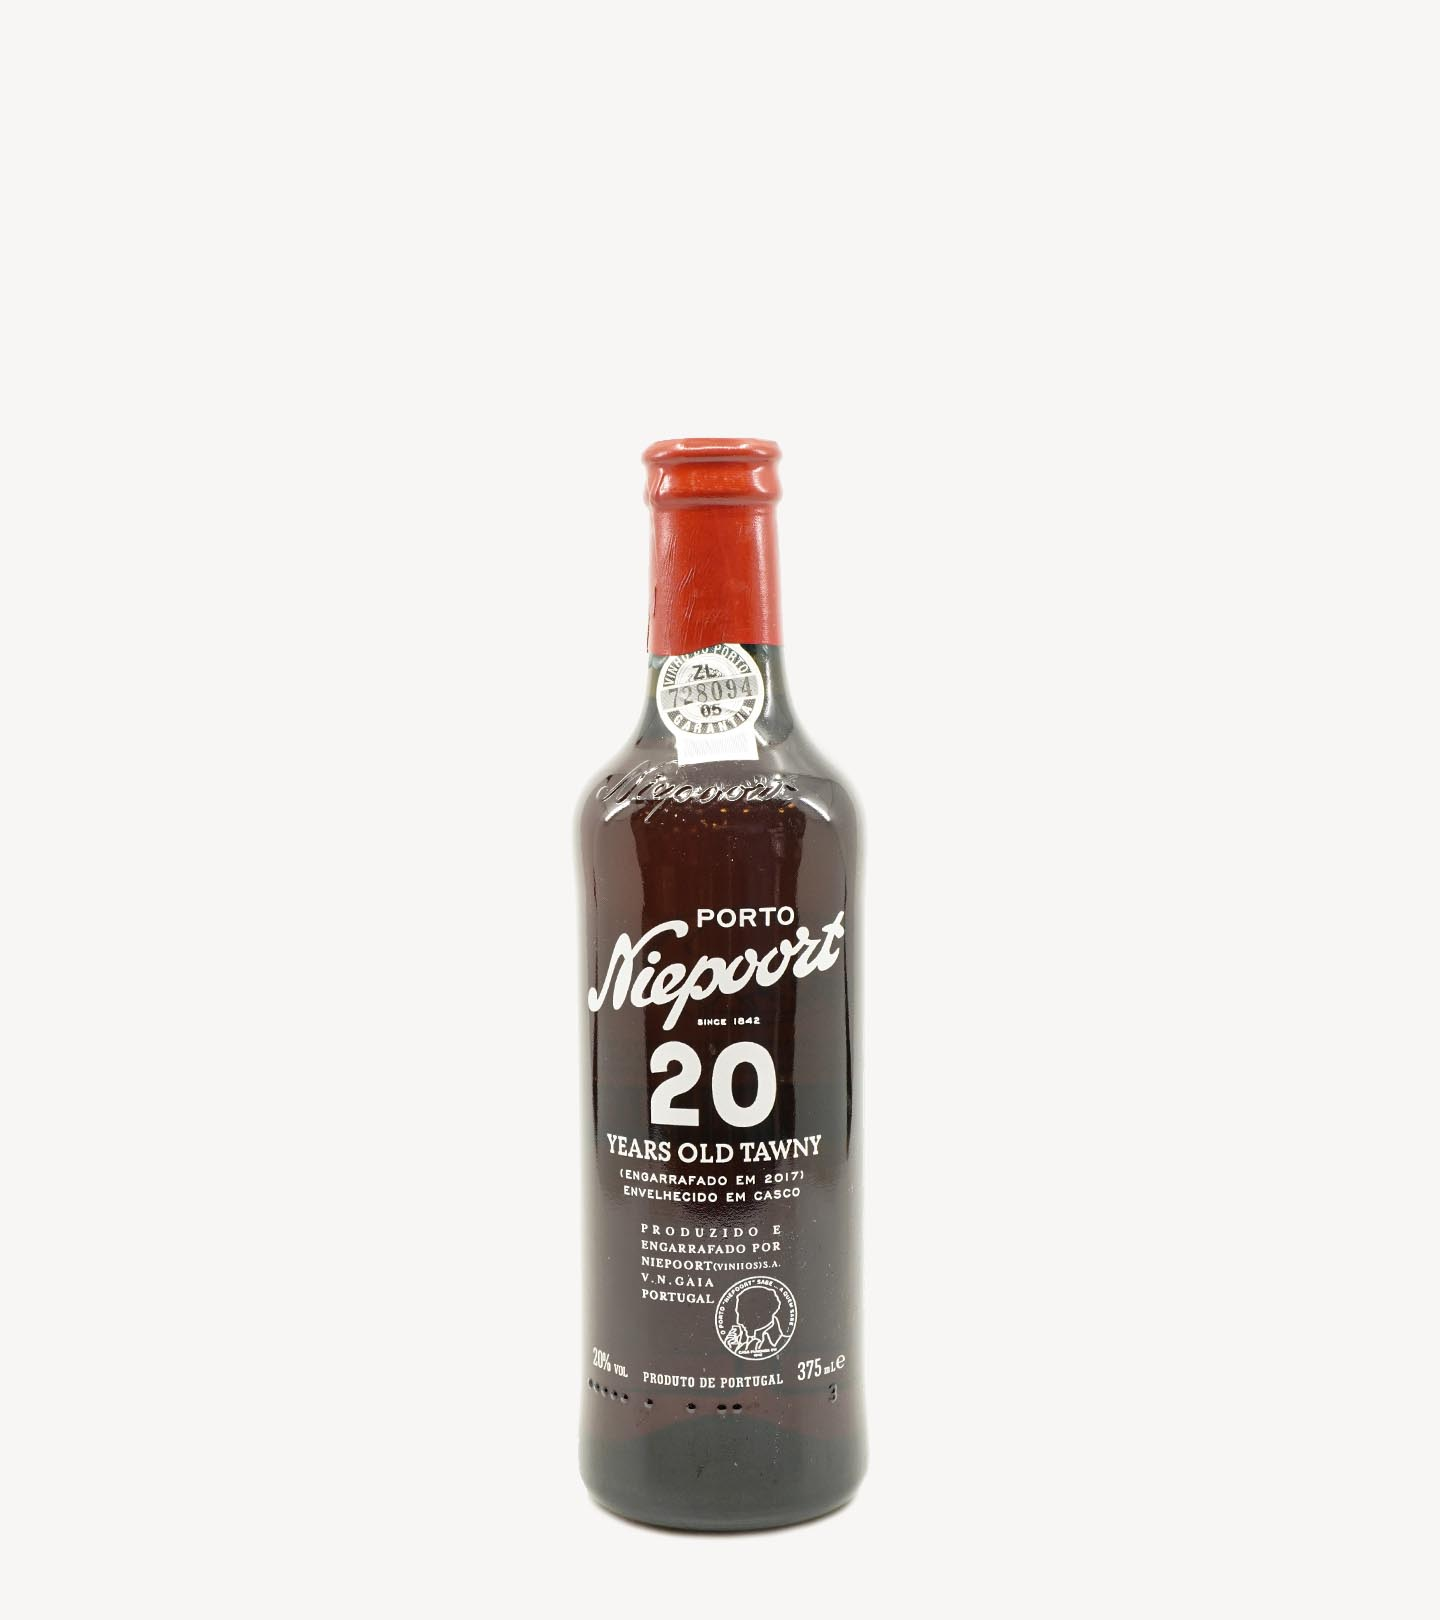 Vinho do Porto Niepoort 20 Years Tawny 37.5 cl